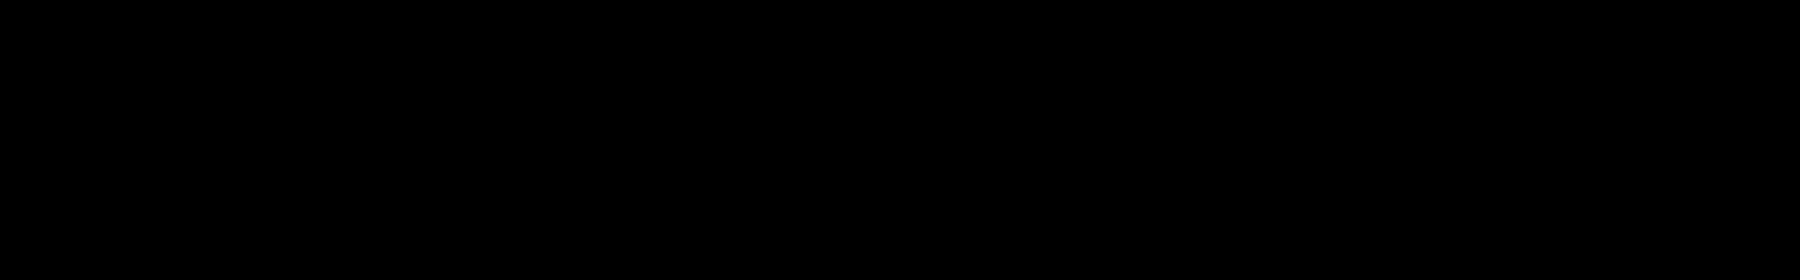 DROPS audio waveform